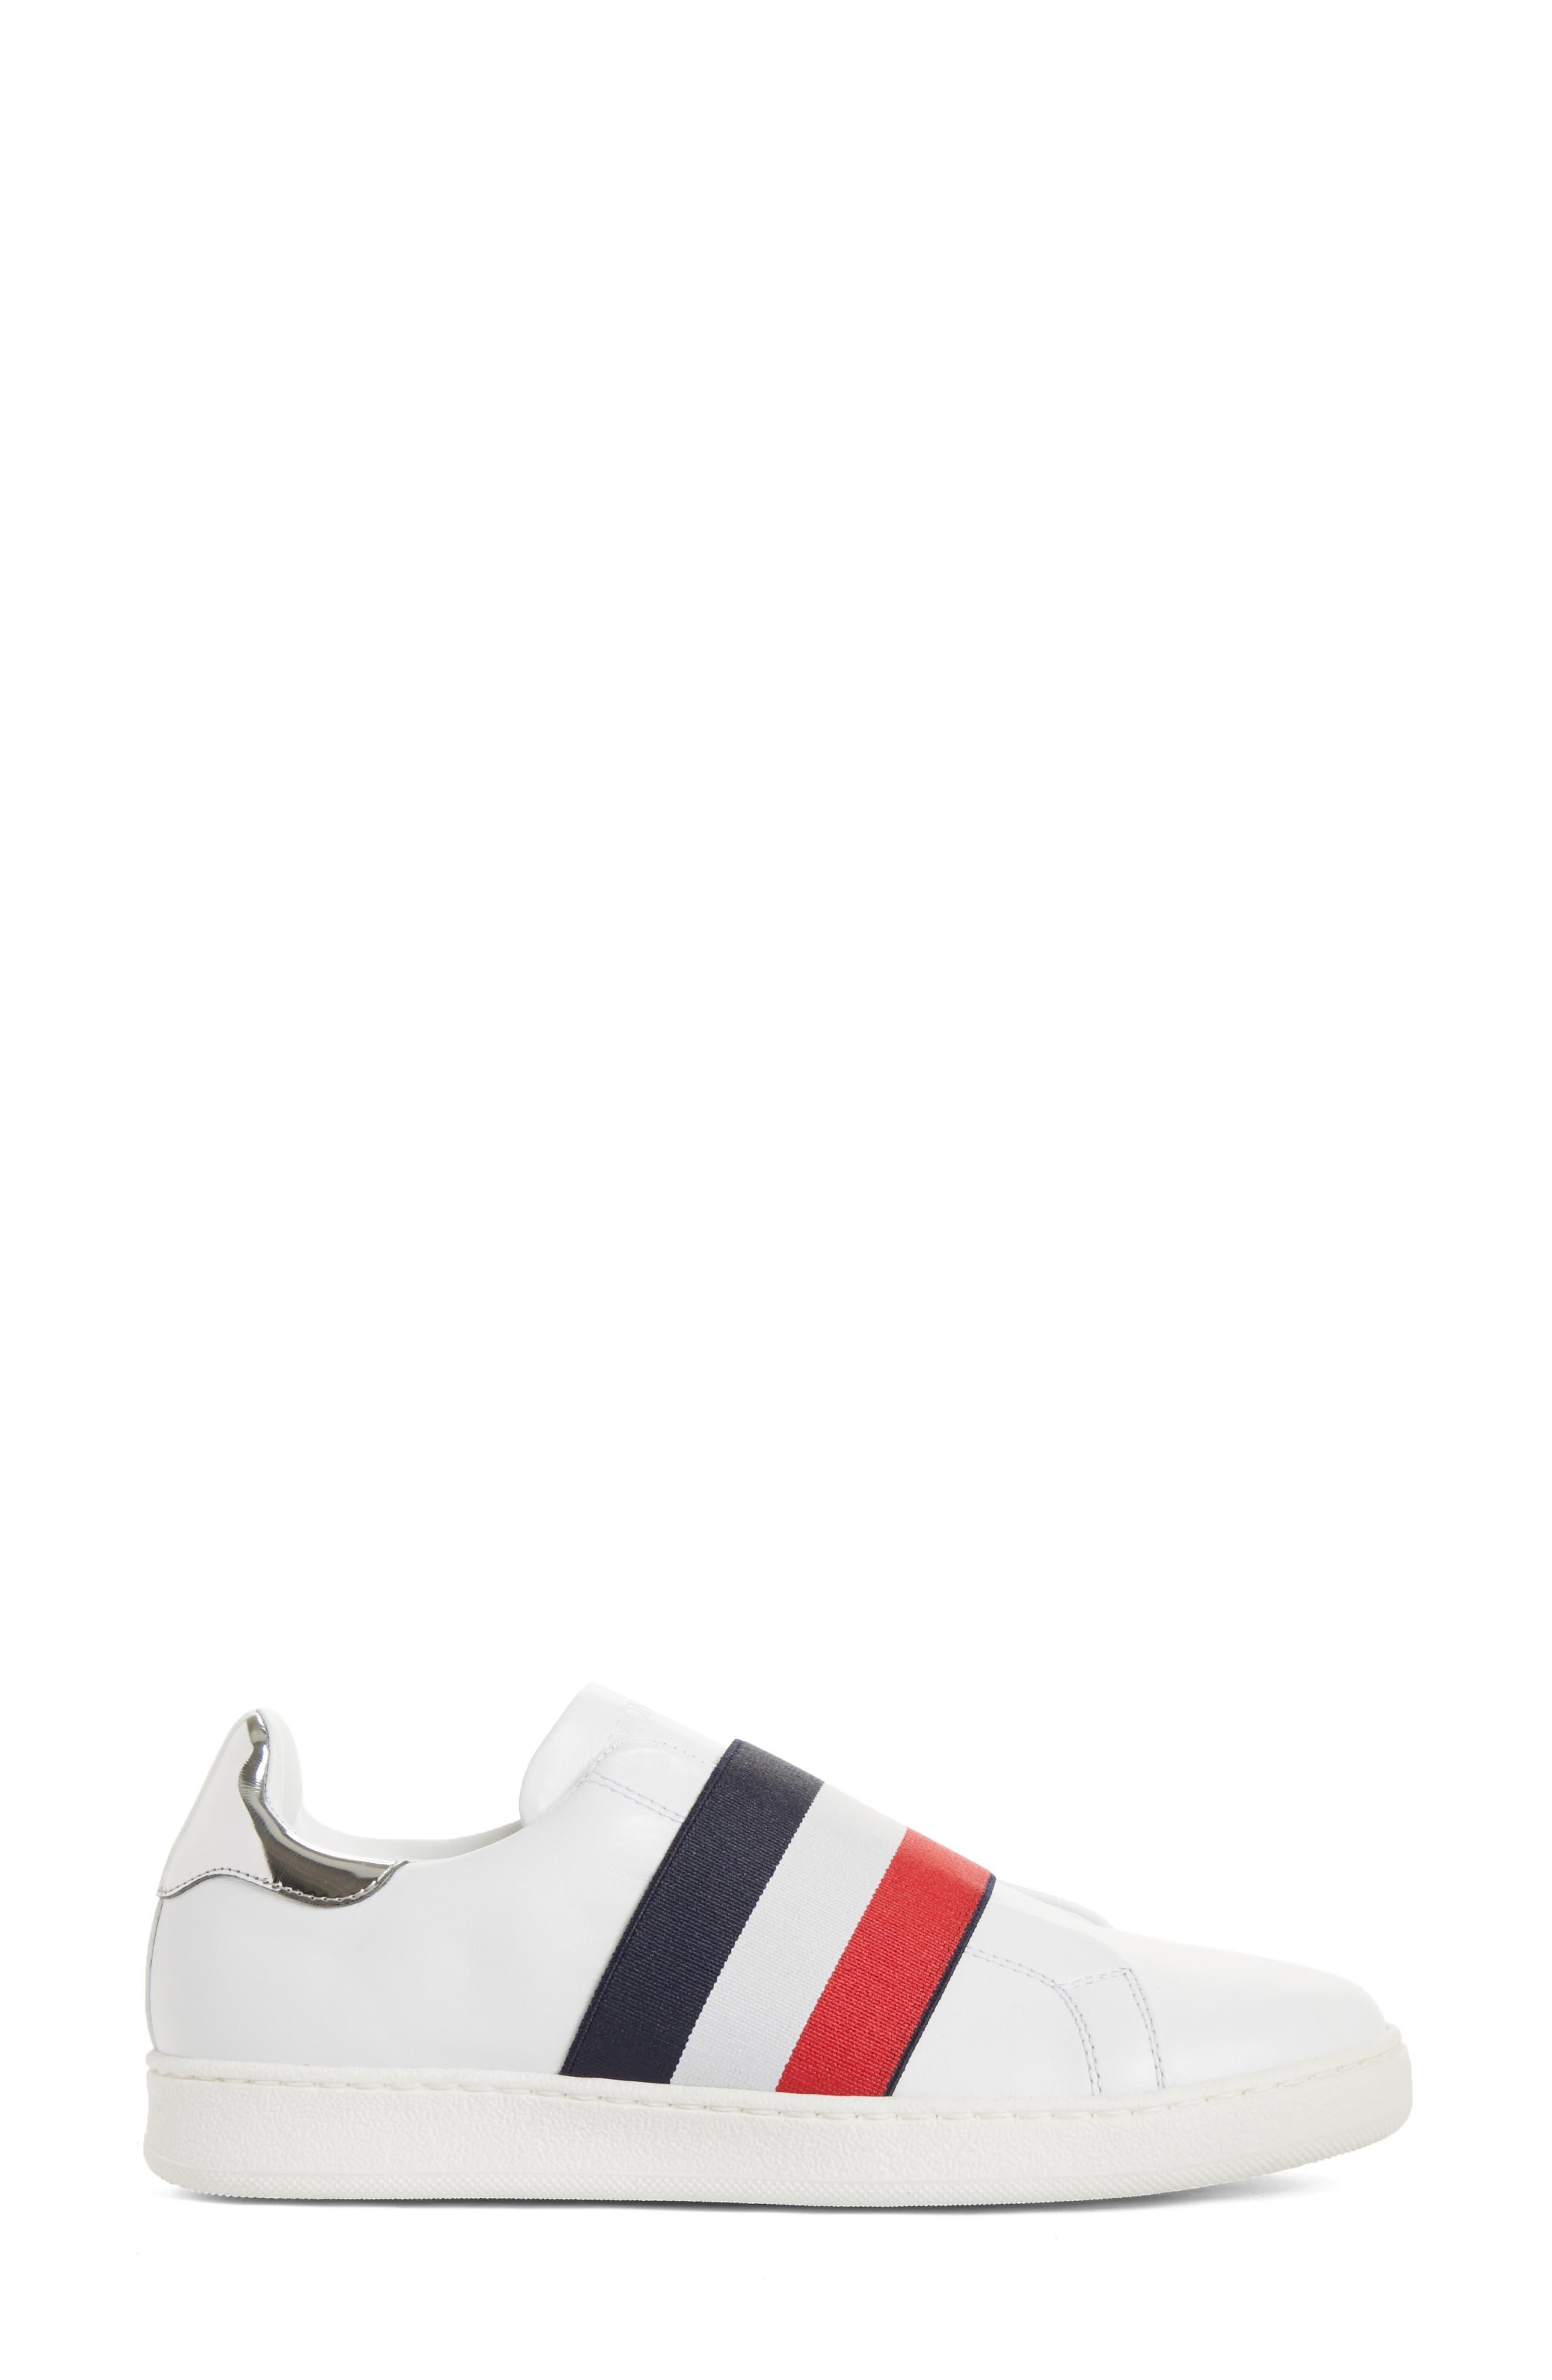 Alizee Low Top Sneaker,                             Alternate thumbnail 3, color,                             100